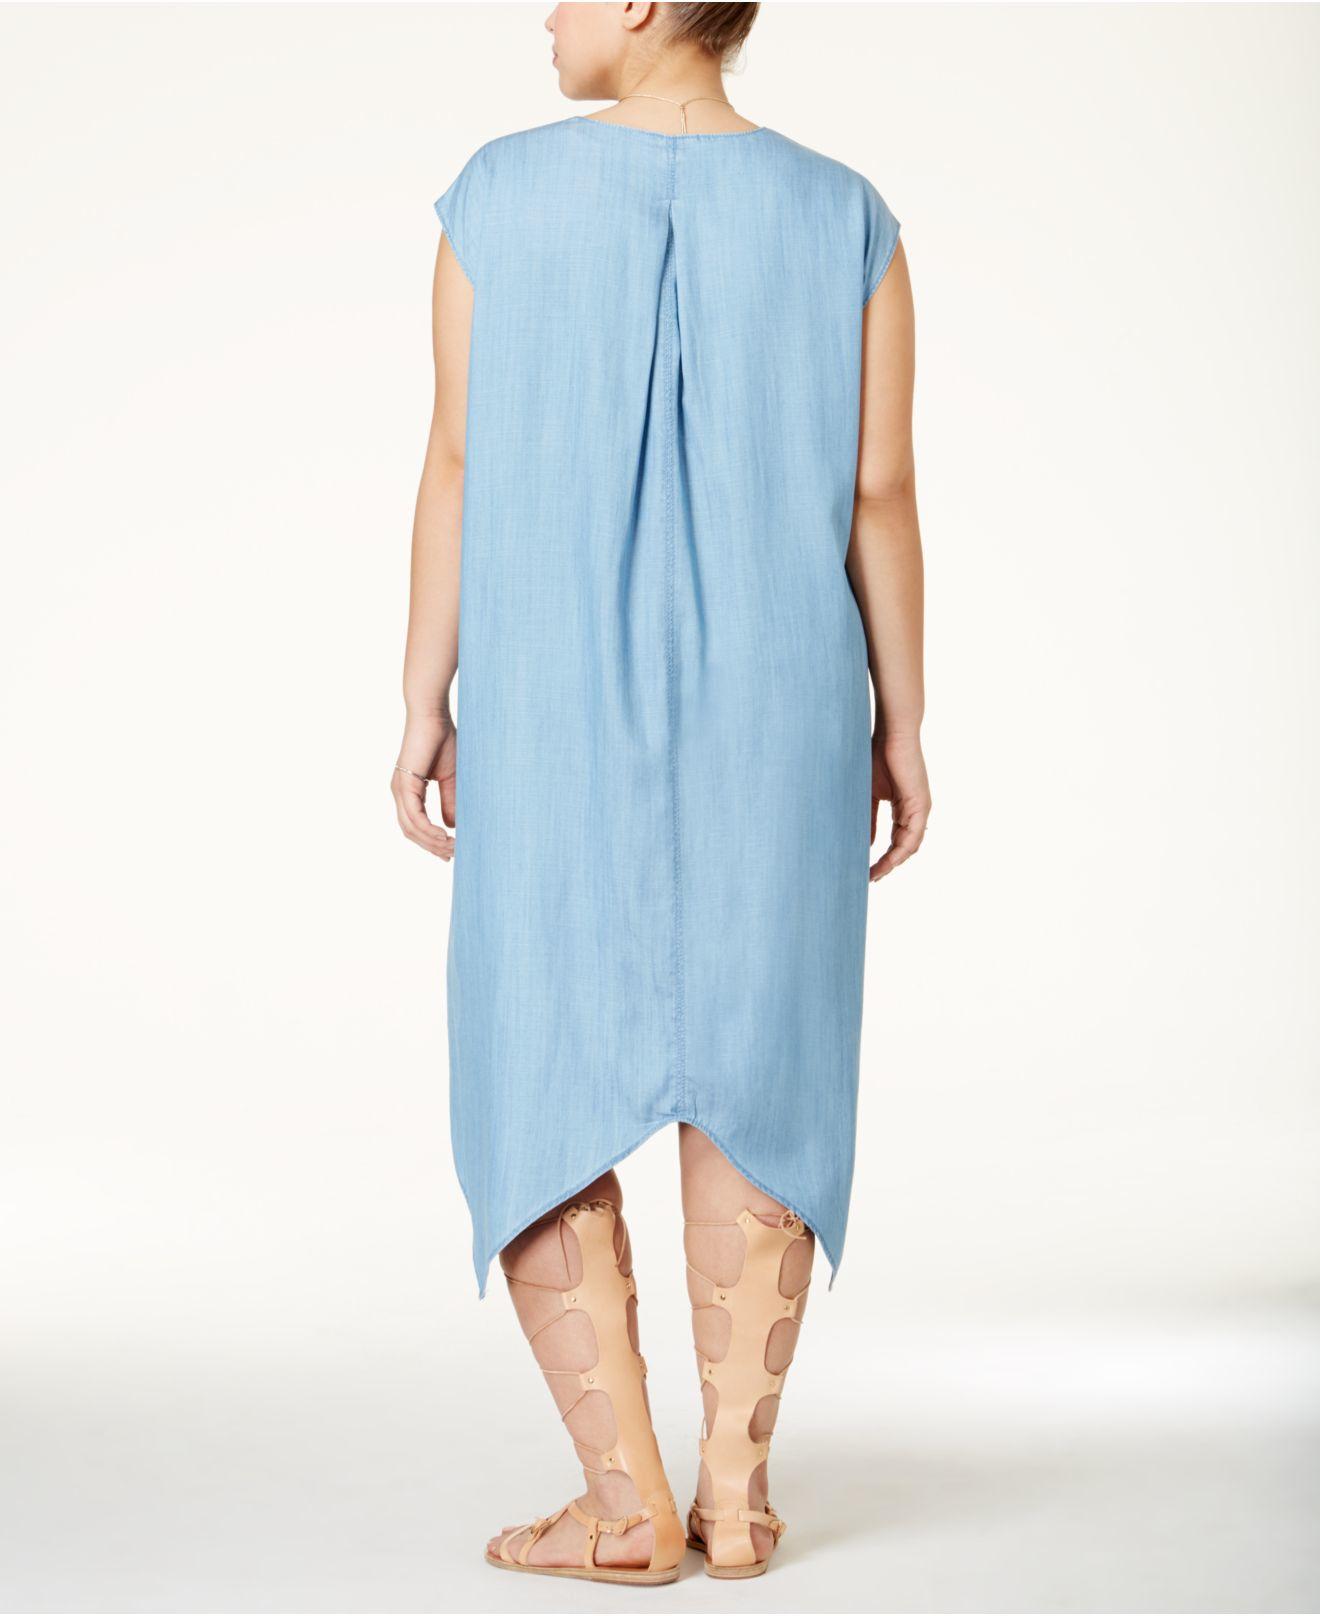 c462ba23d904c Lyst - RACHEL Rachel Roy Curvy Plus Size Sydney High-low Shift Dress ...